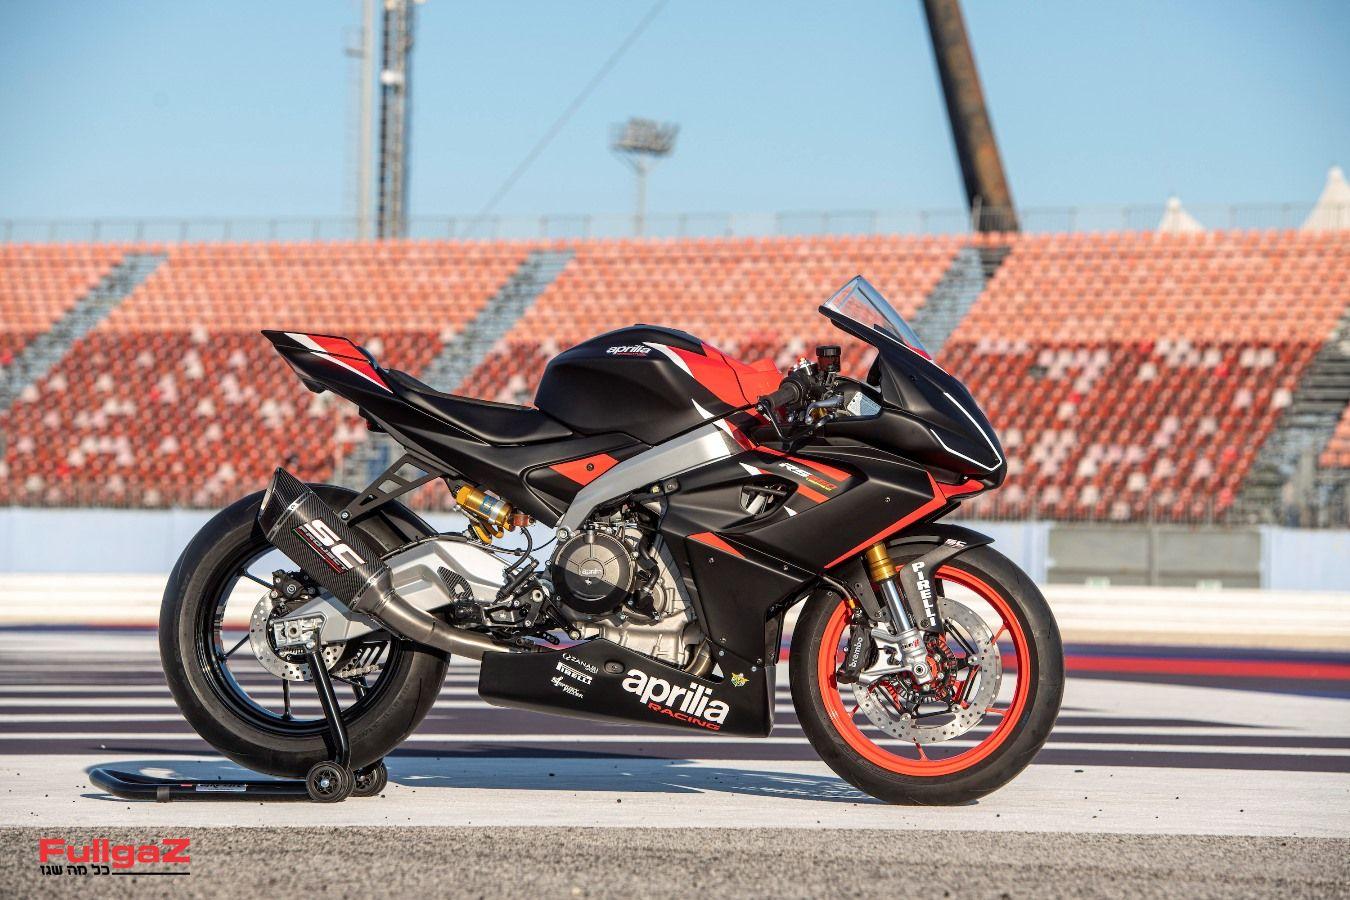 02_RS 660 Trofeo